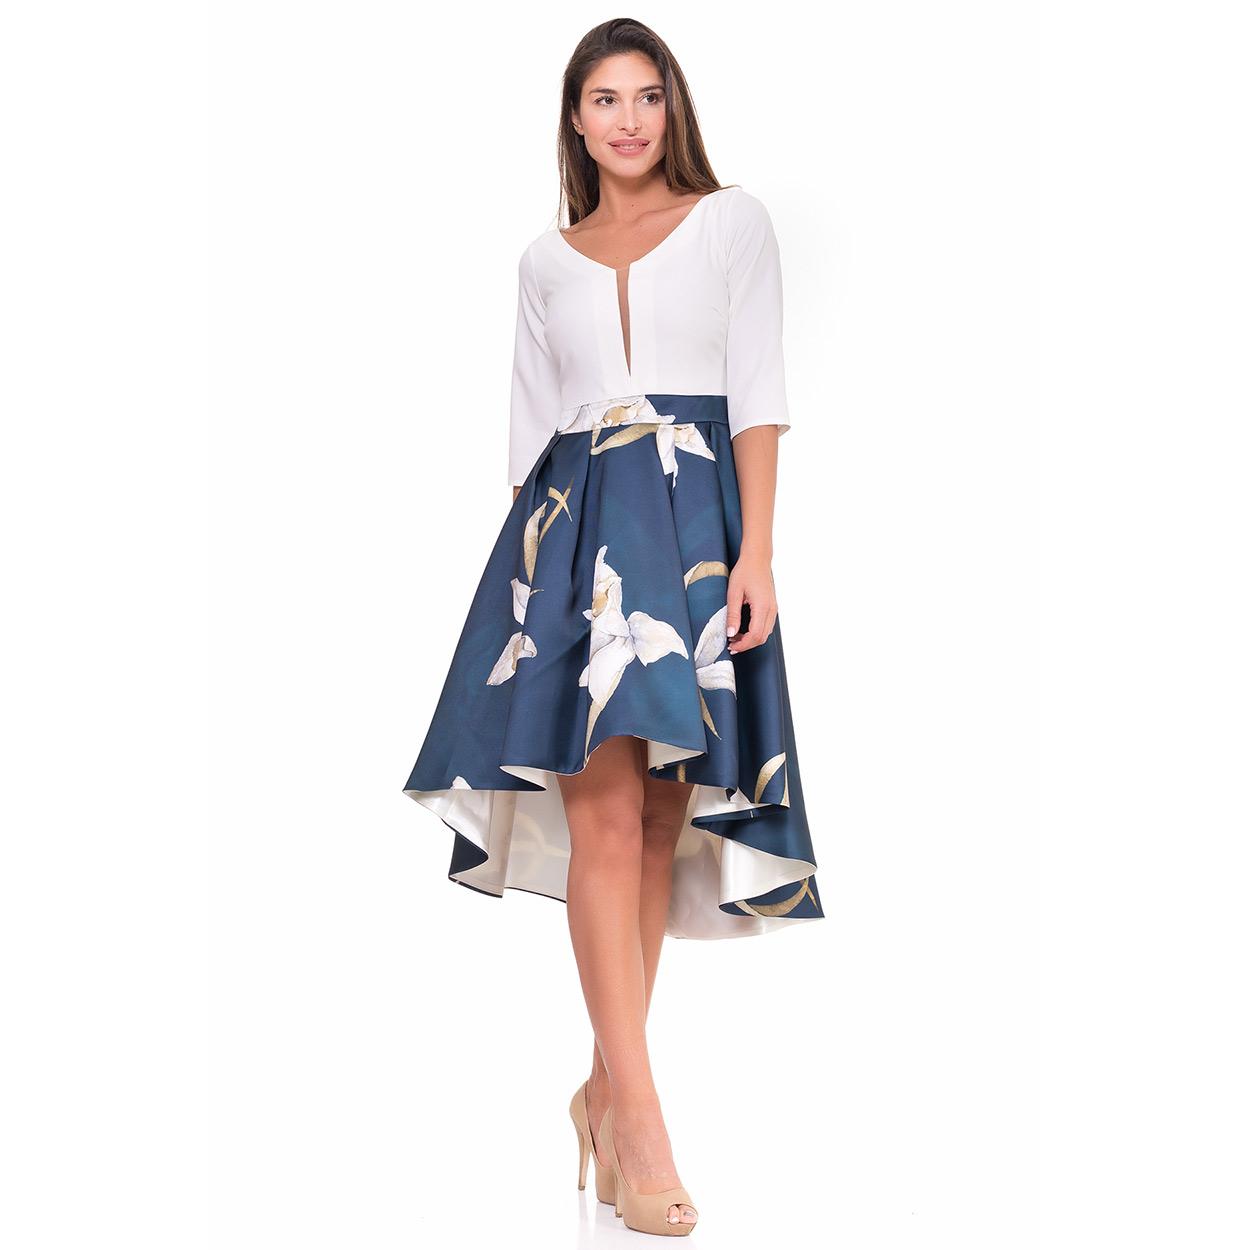 Vestido azul midi